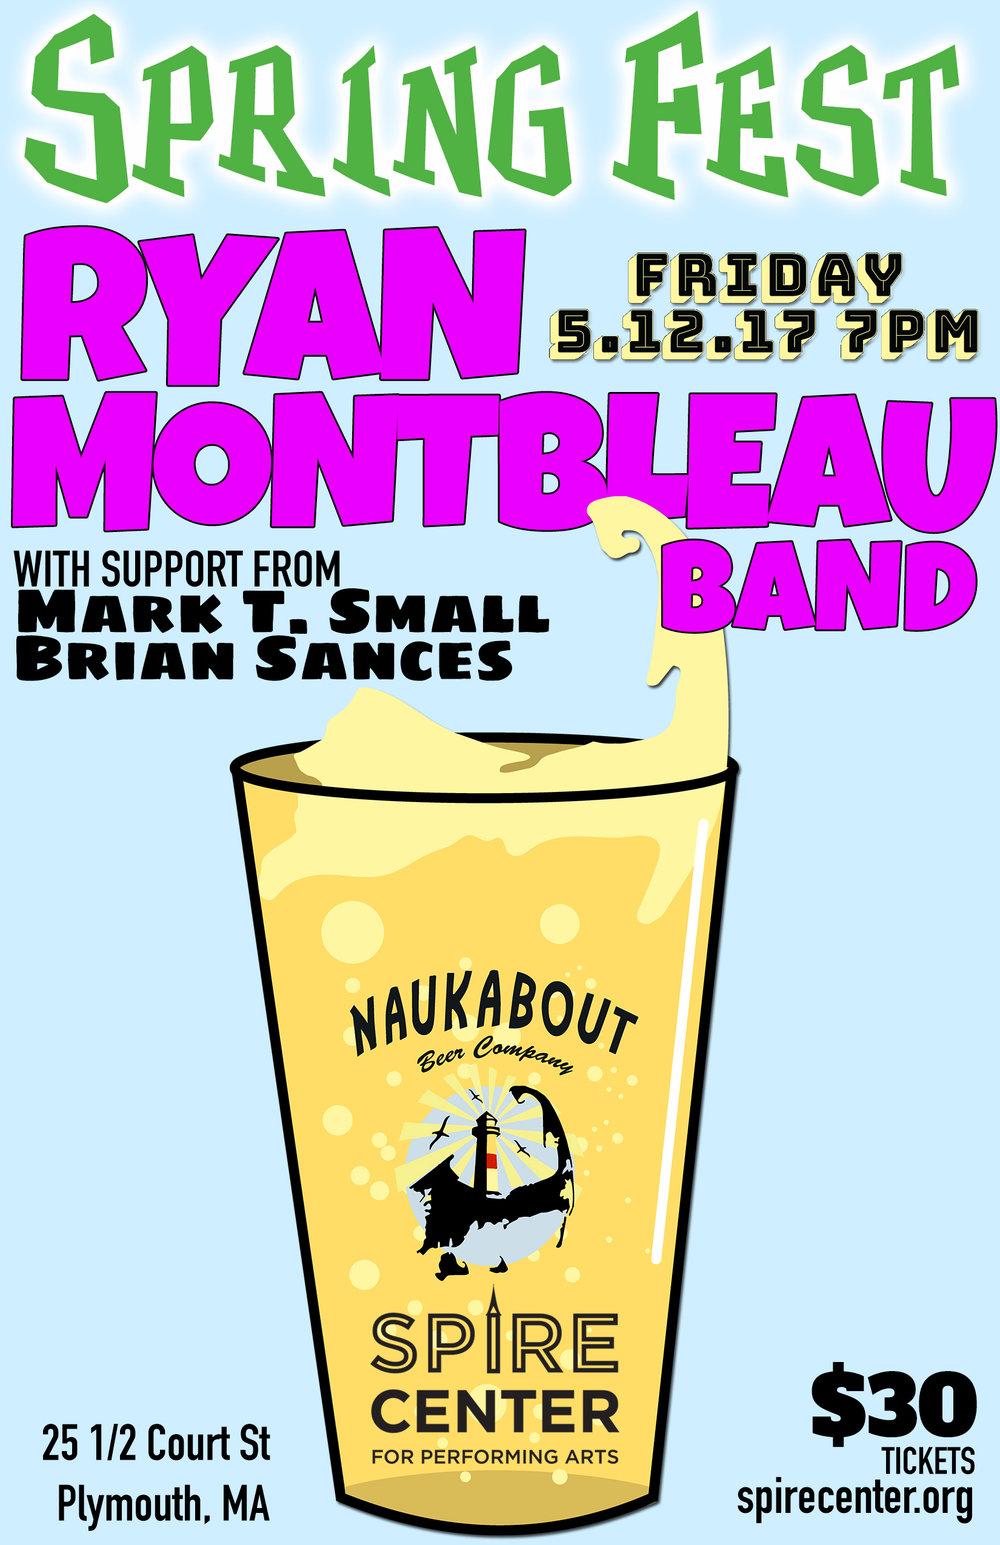 Naukabout Spring Fest w/ Ryan Montbleau